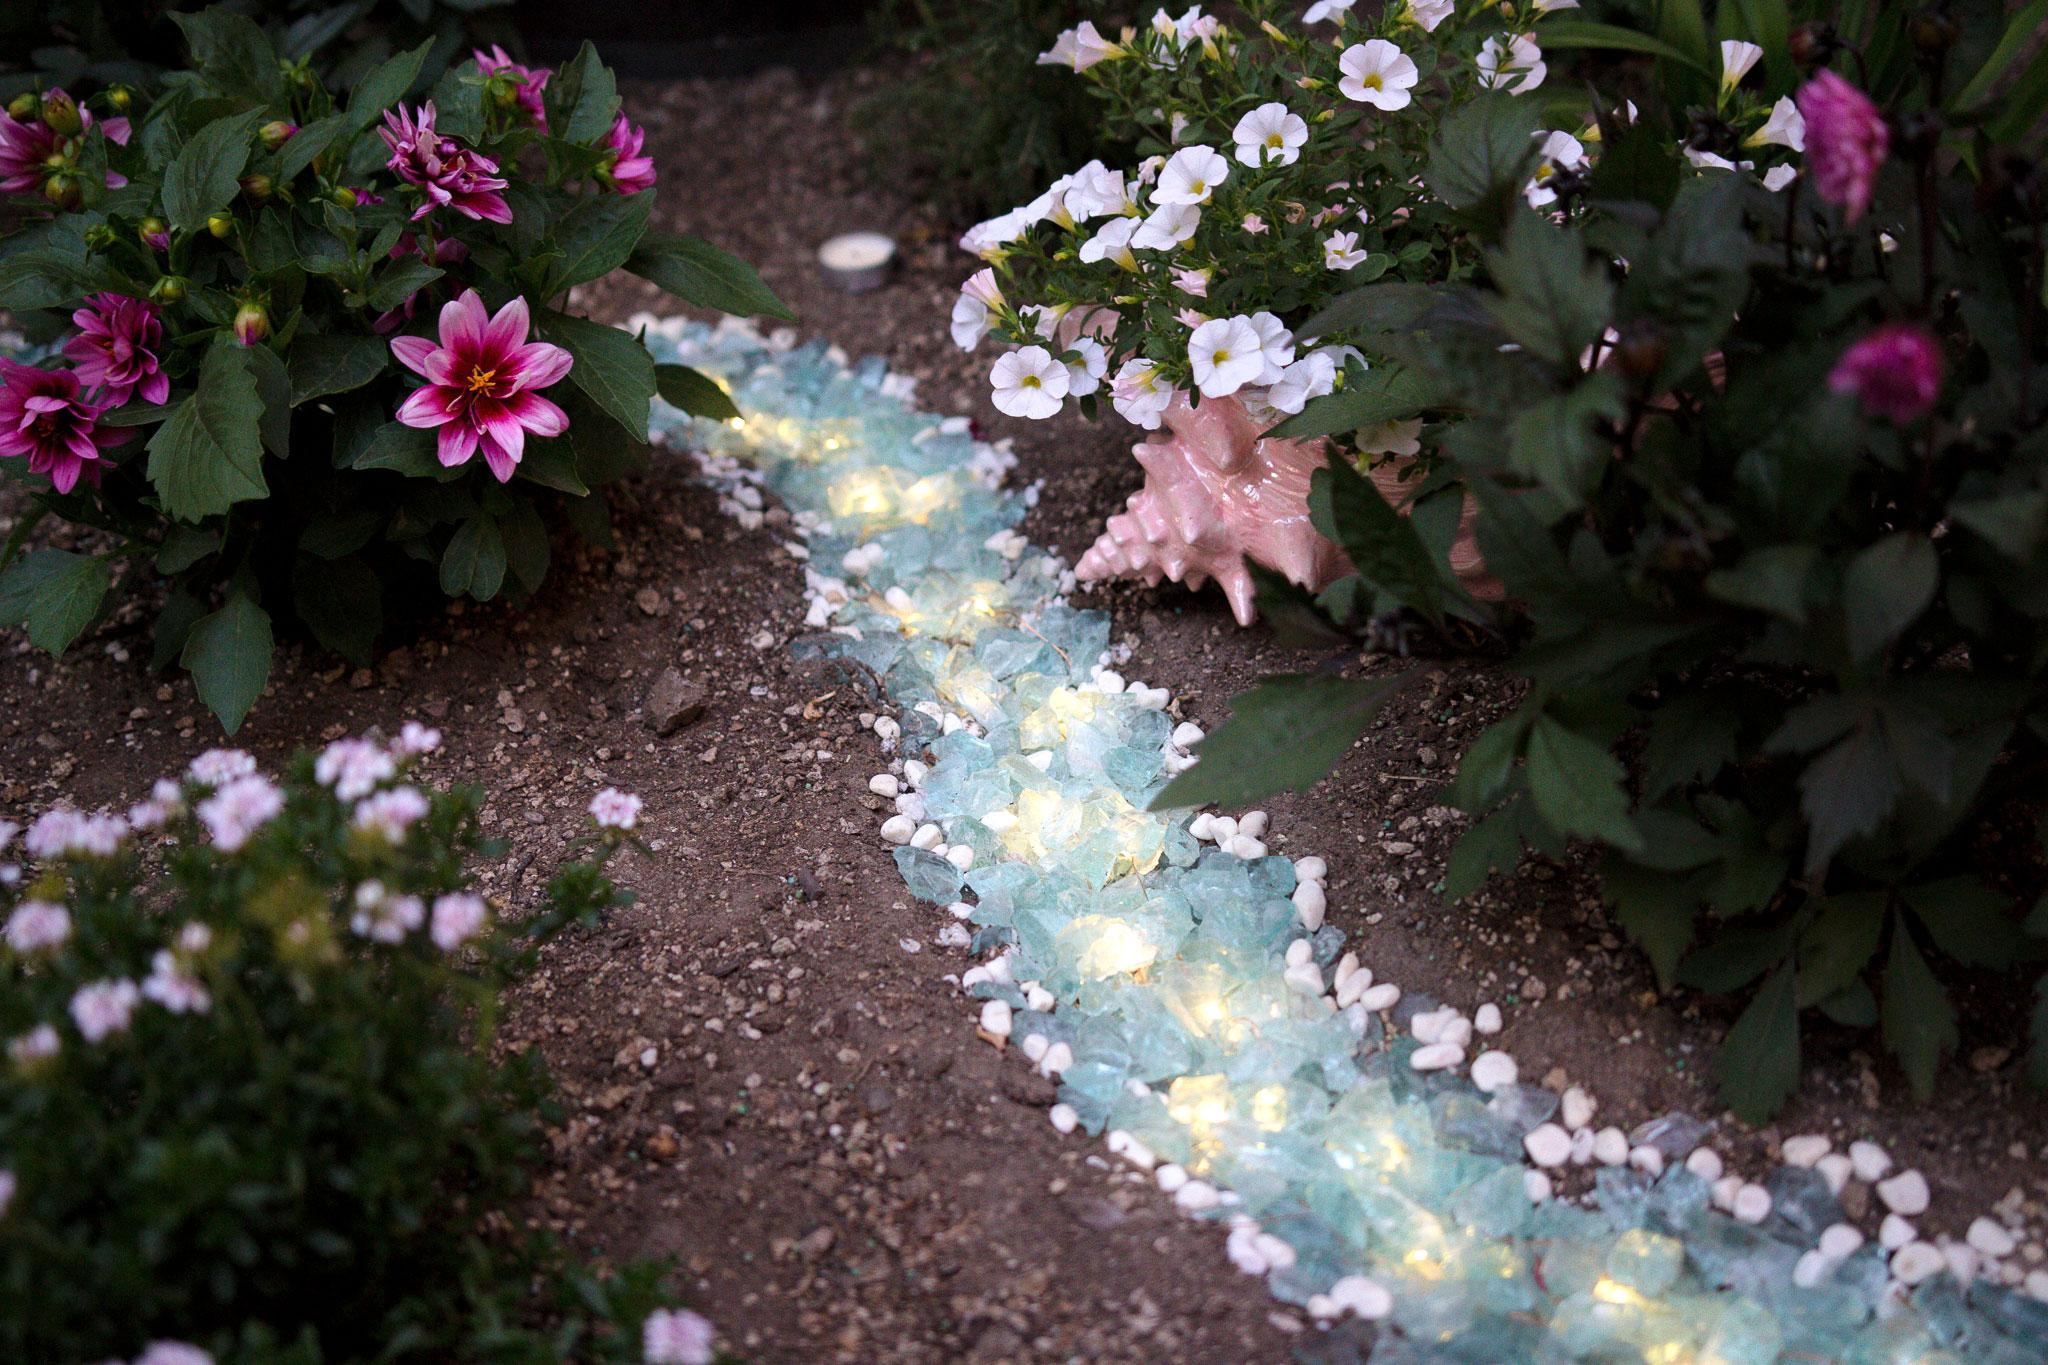 Adelya_Tumasyeva_the-garden-project_35.jpg